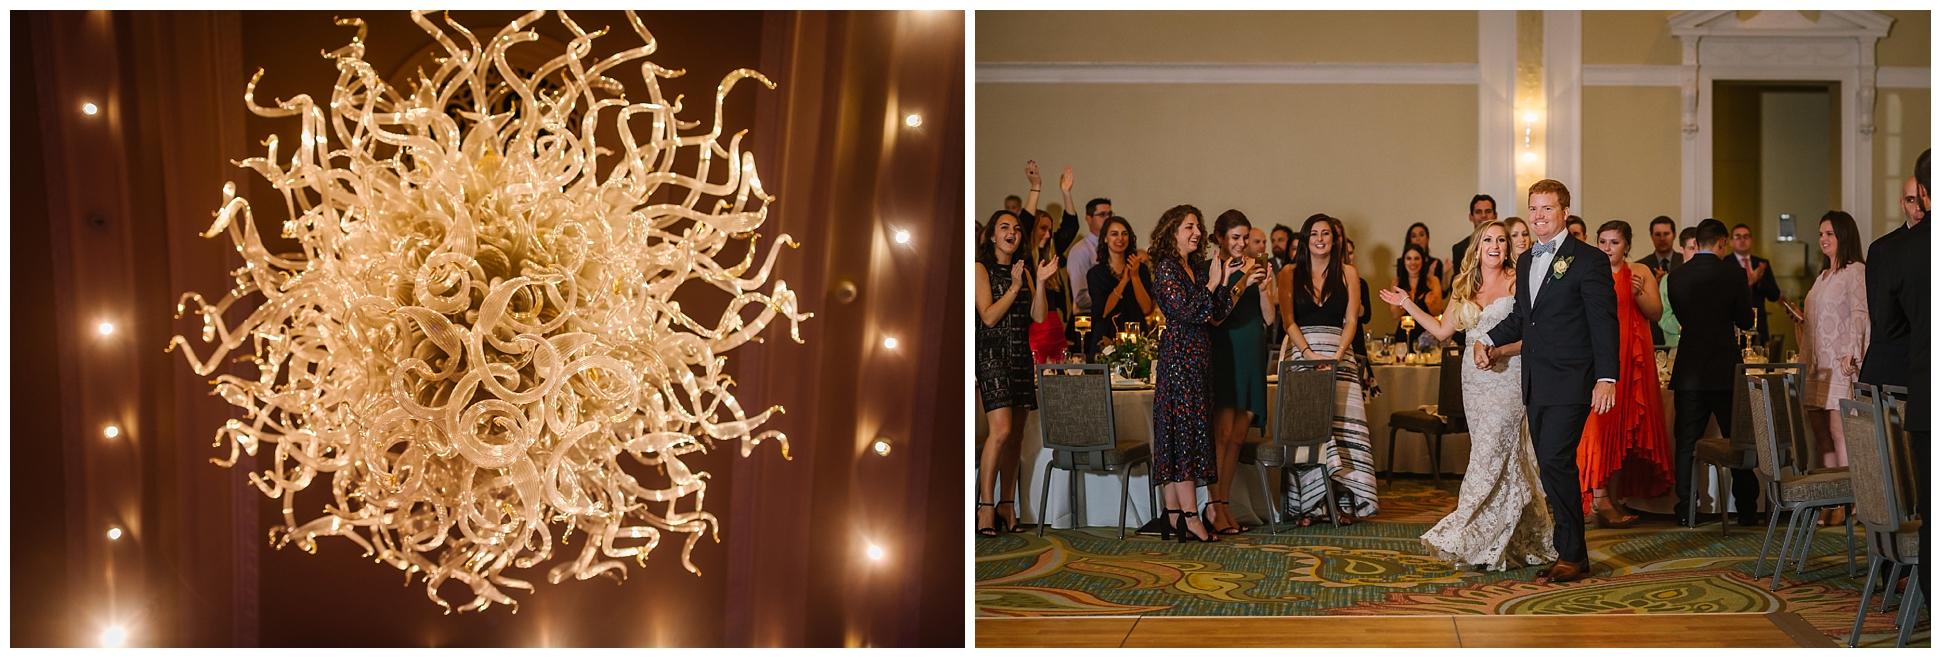 St-pete-wedding-photographer-grand-ballroom-vinoy-tea-garden-greek-luxury_0173.jpg